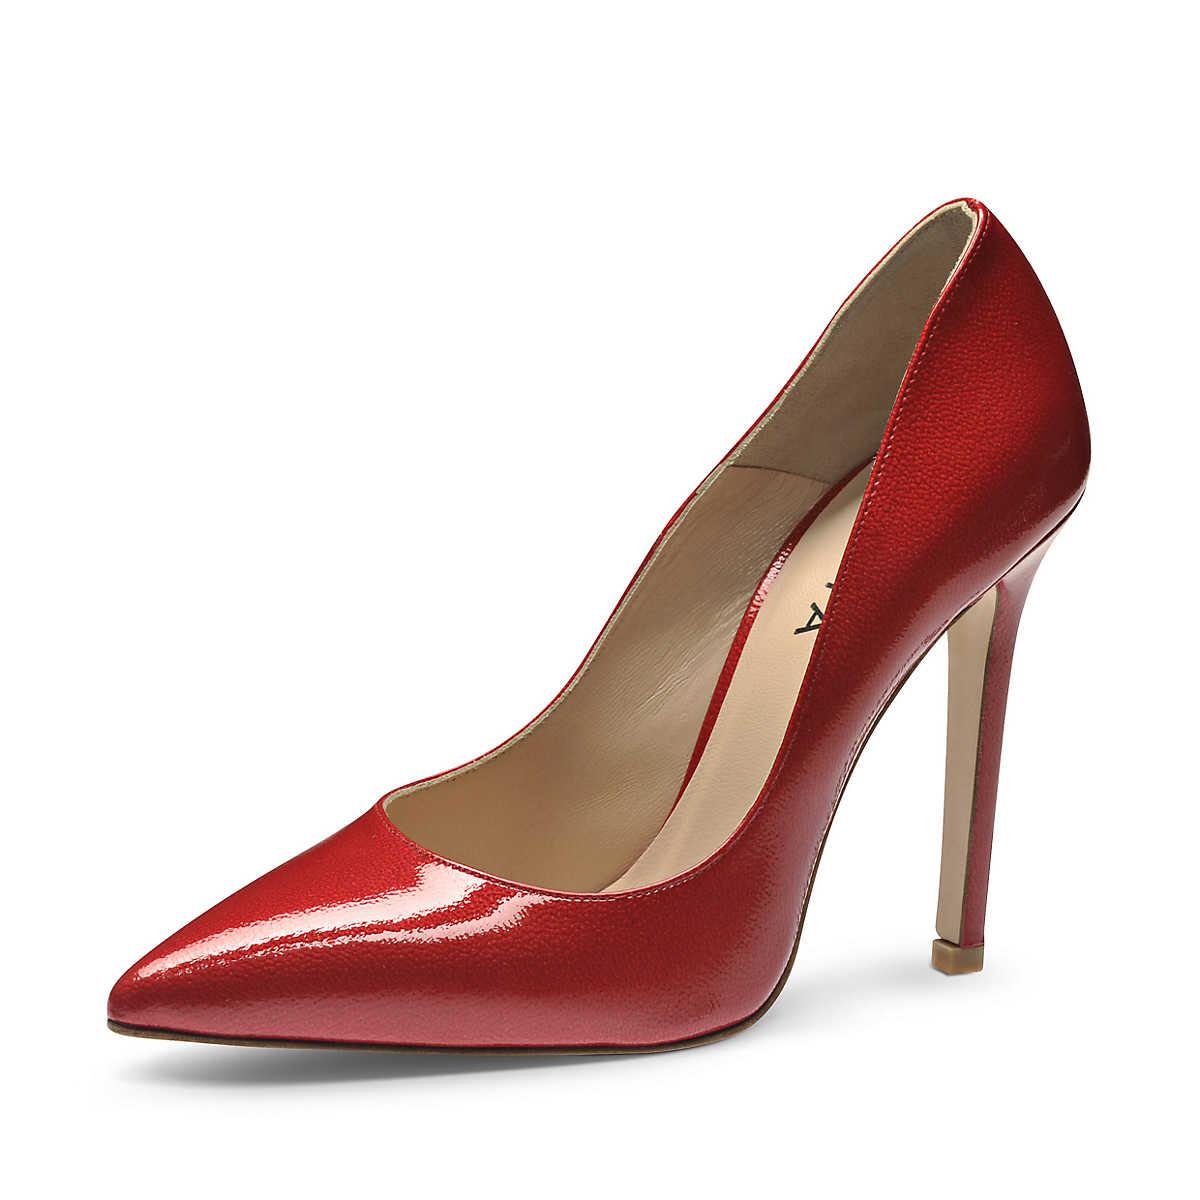 Evita Shoes Pumps rot - Evita Shoes - Pumps - Schuhe - mirapodo.de